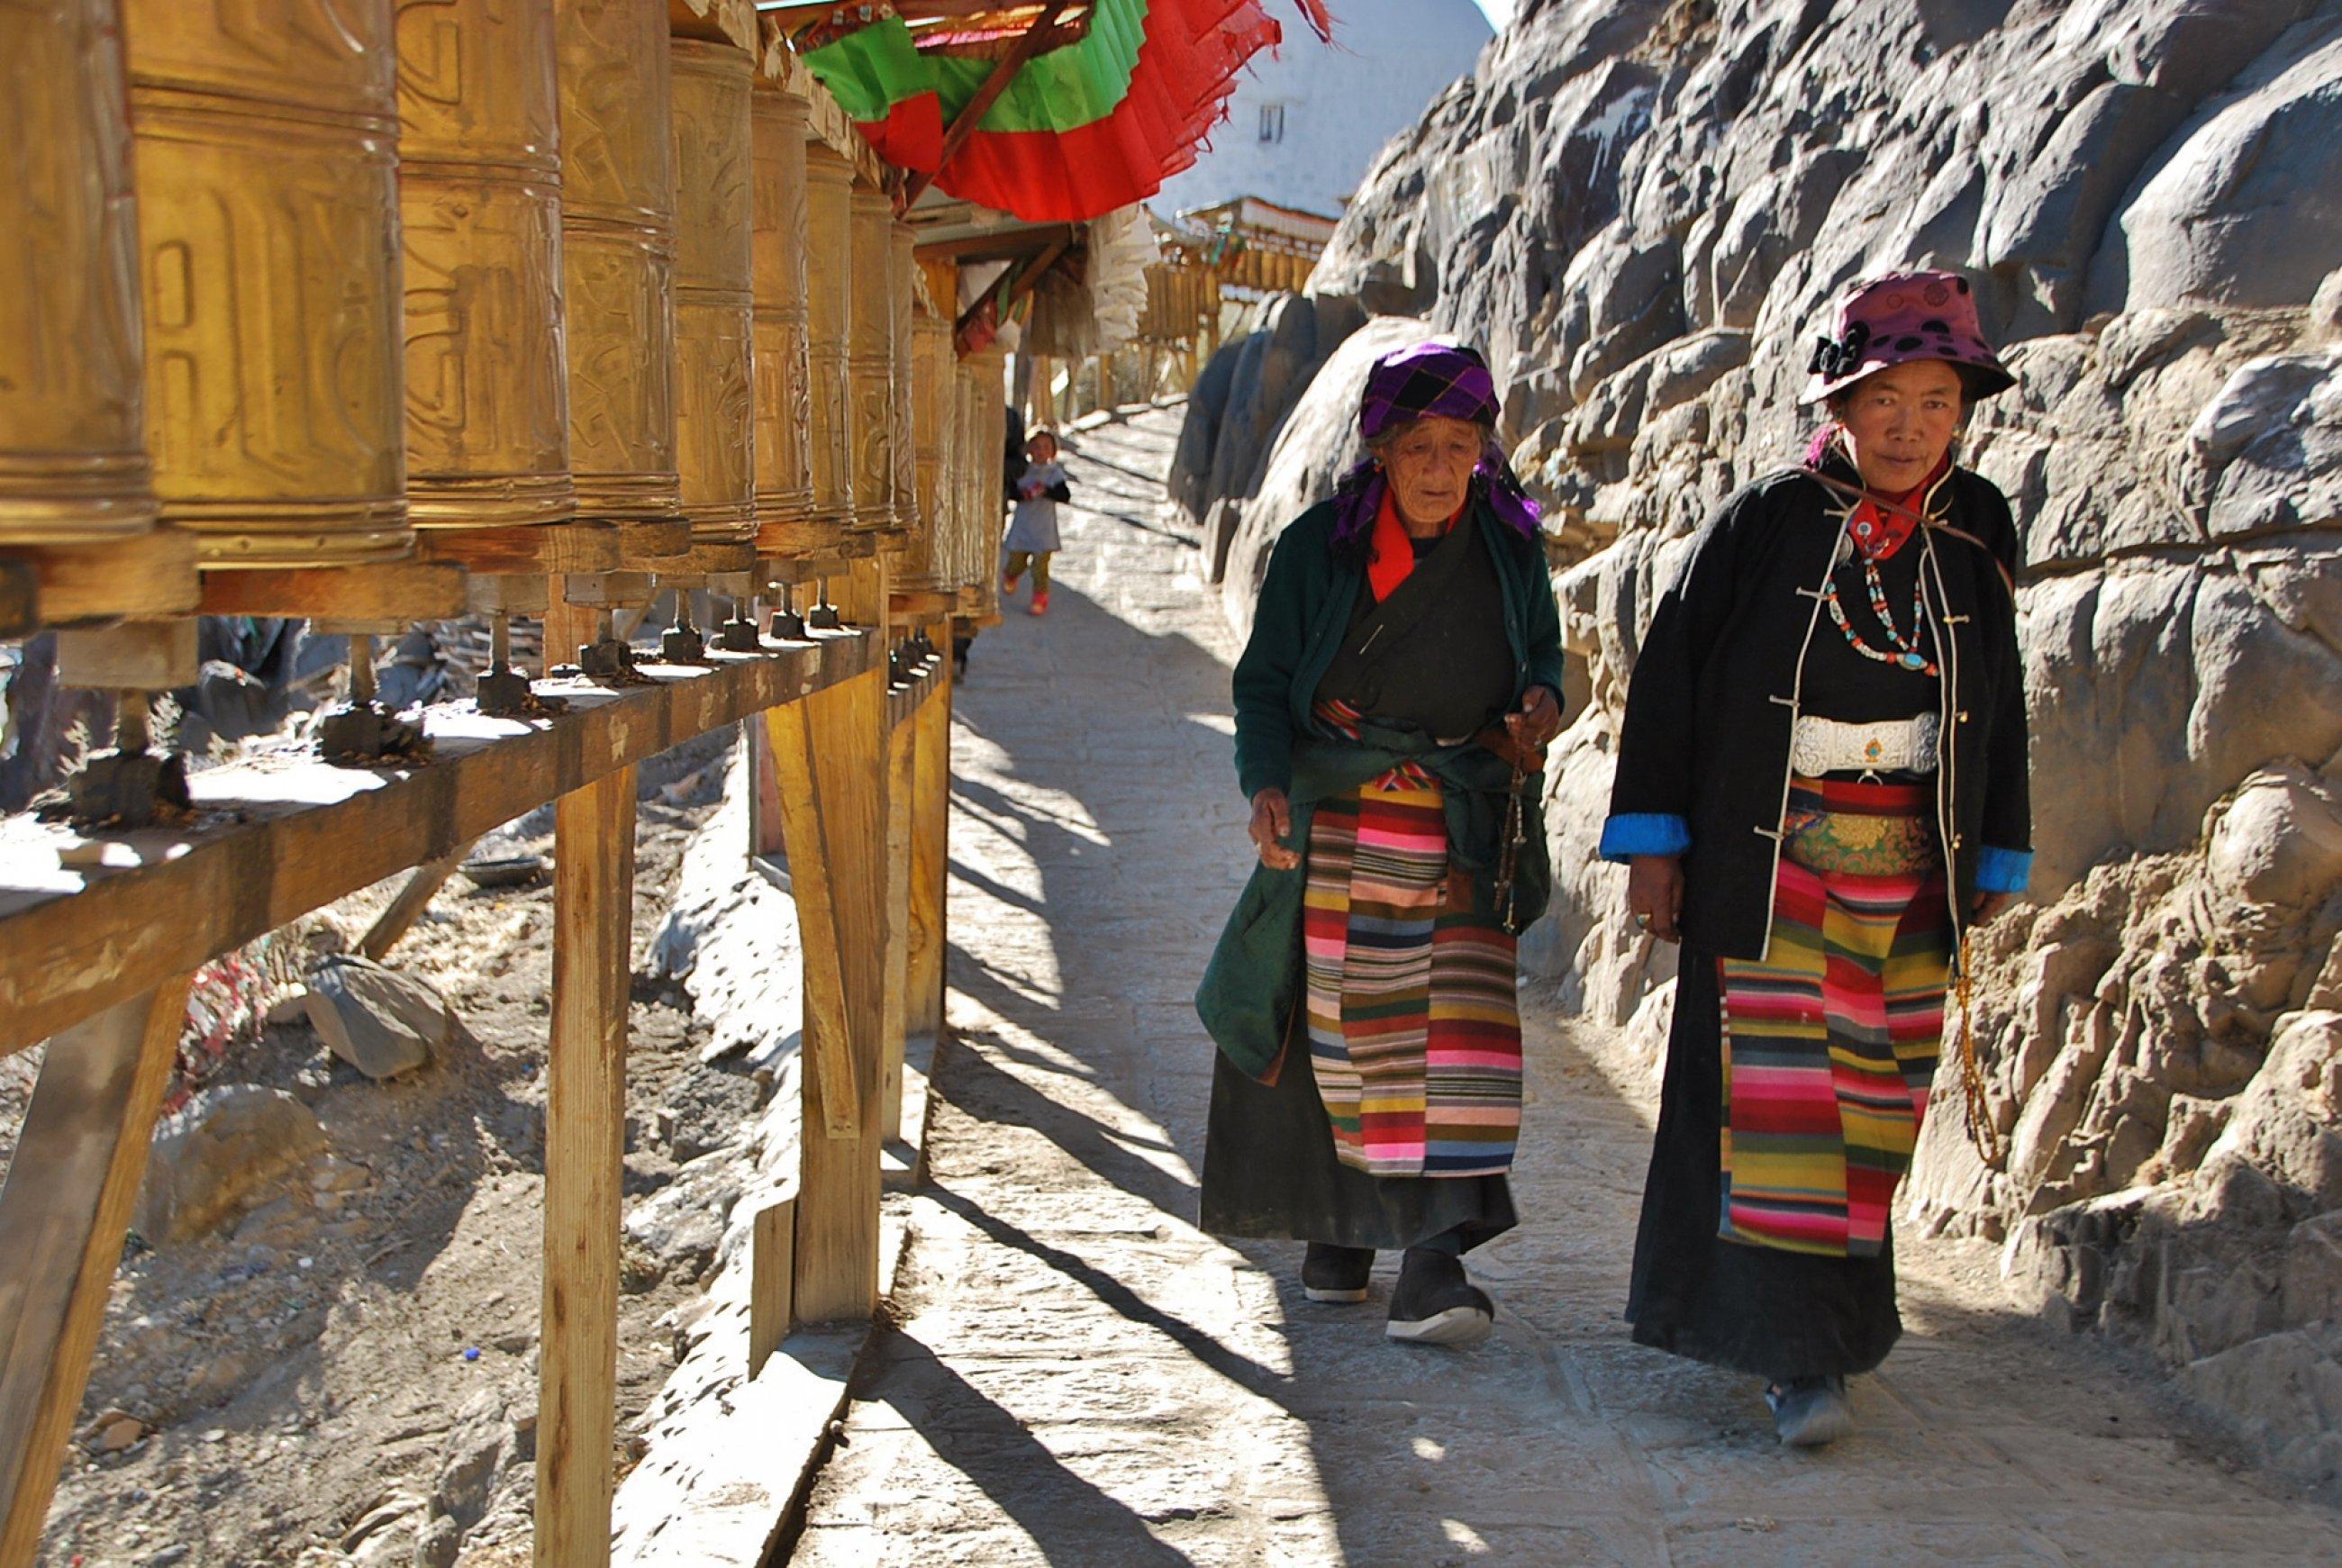 https://bubo.sk/uploads/galleries/16319/tibet-ctni-11-2014-mirka-sulka-278-.jpg